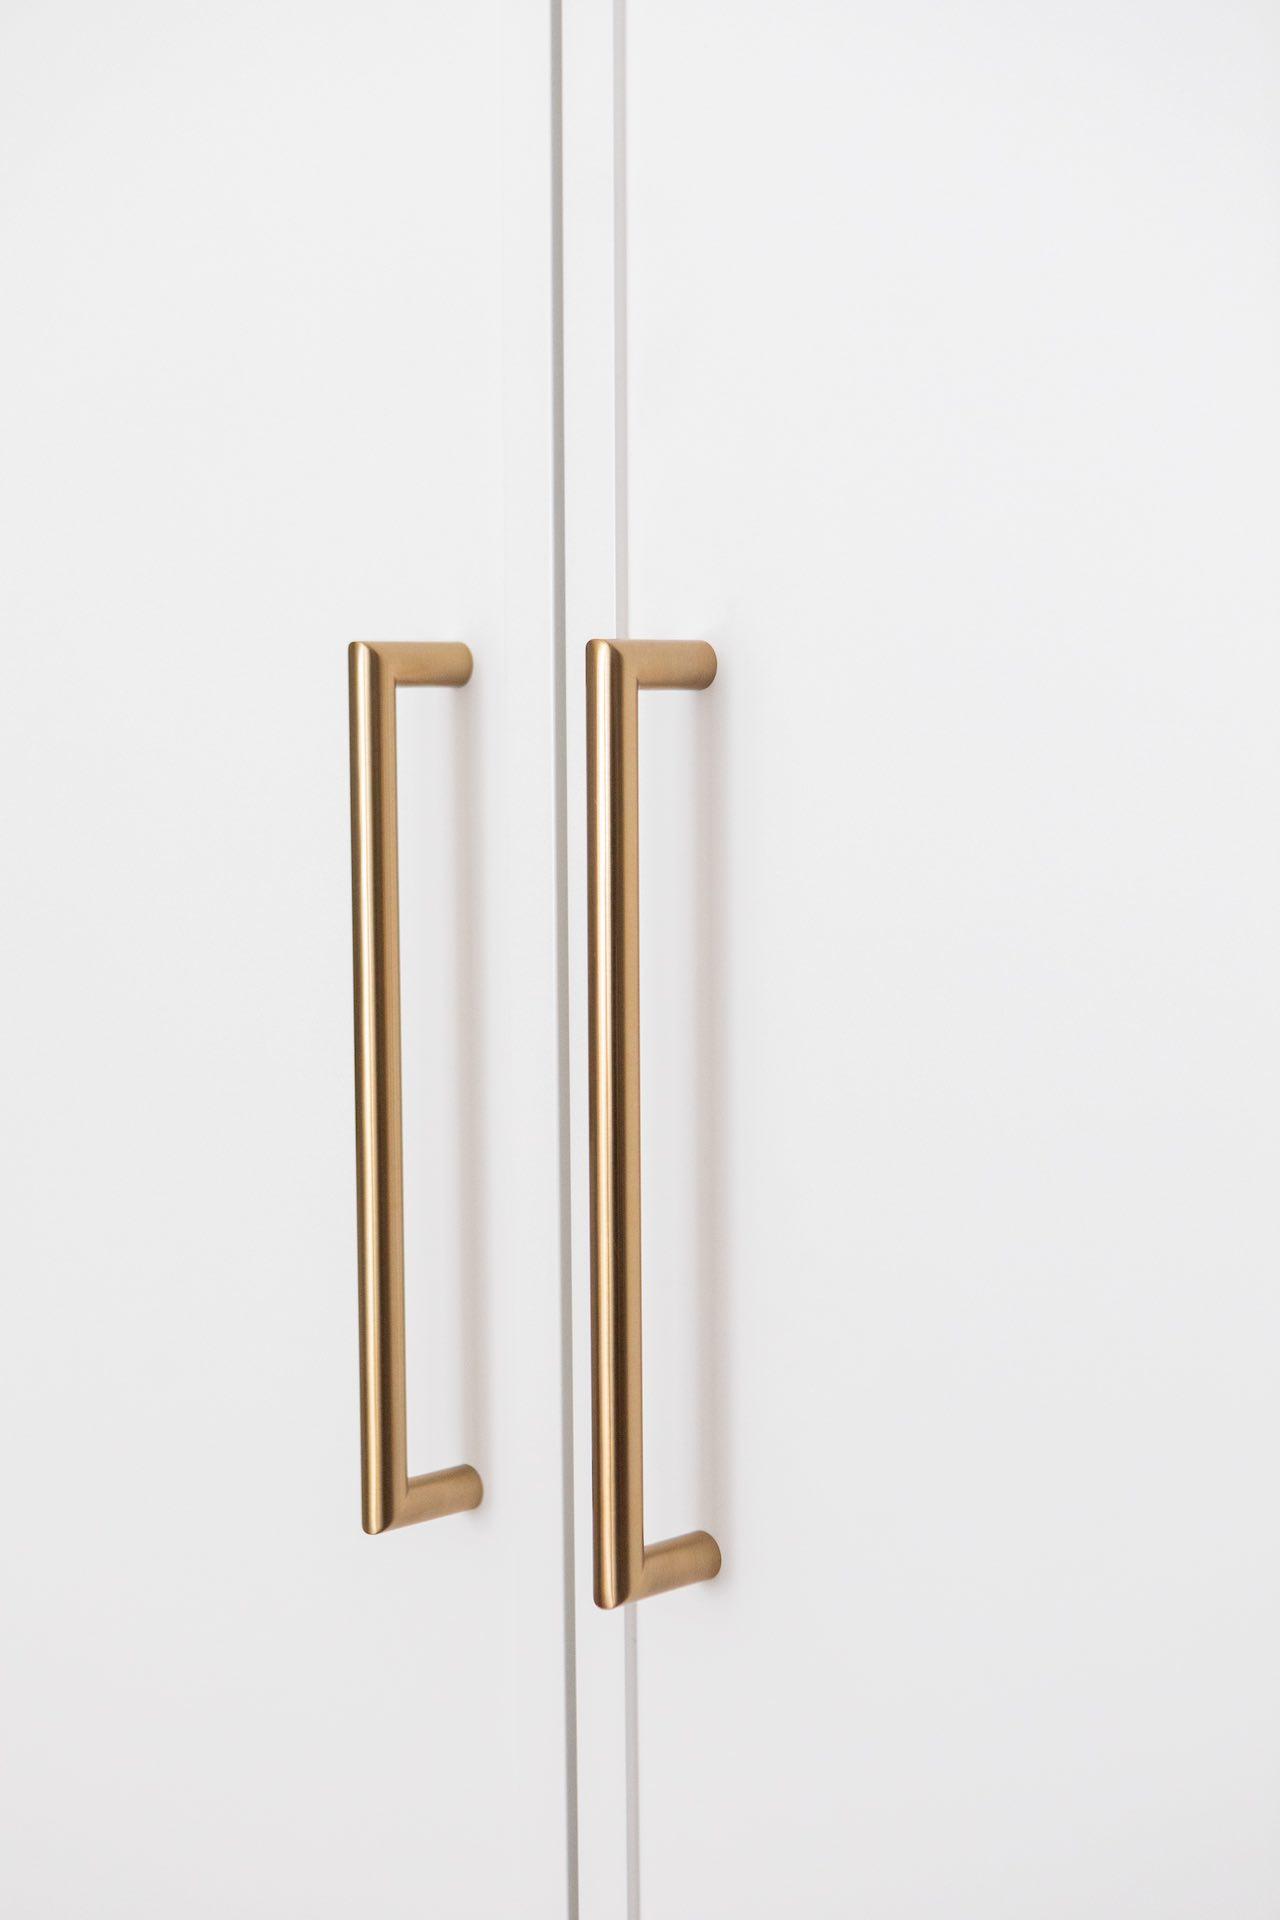 Gold cabinet handles